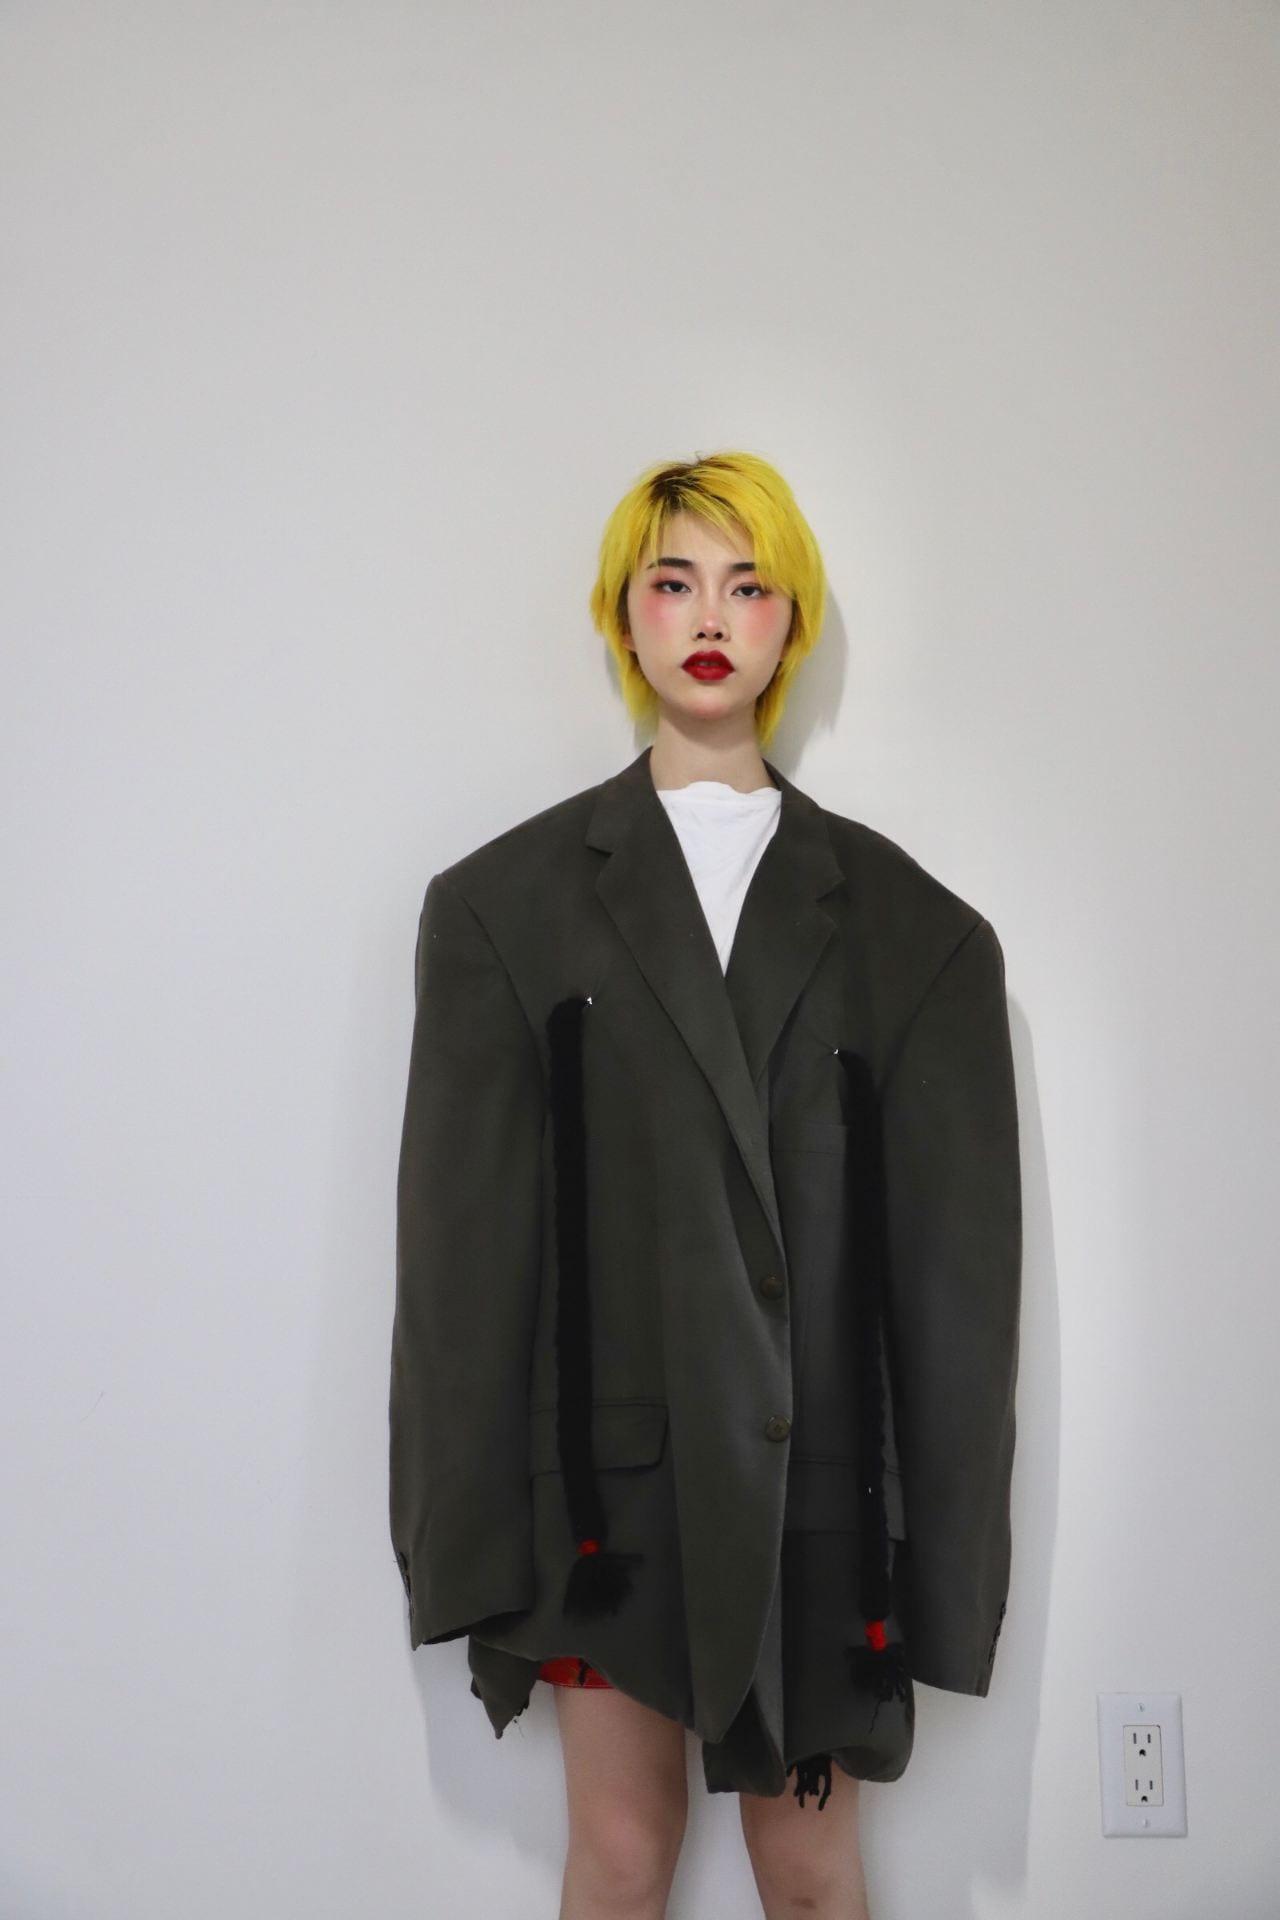 Fashion Activism–The braid